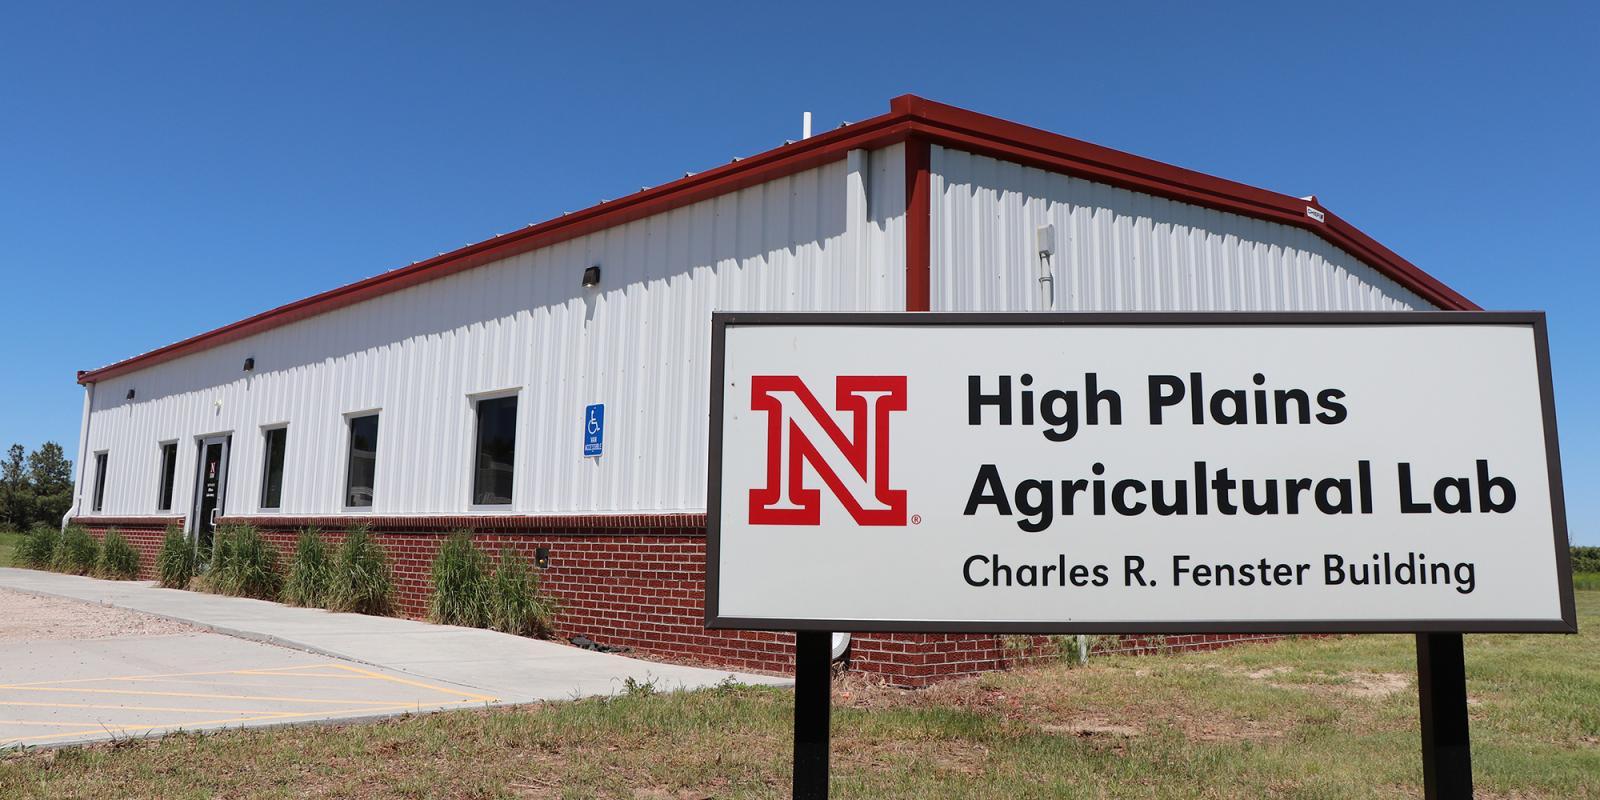 High Plains Ag Lab headquarters building near Sidney, NE